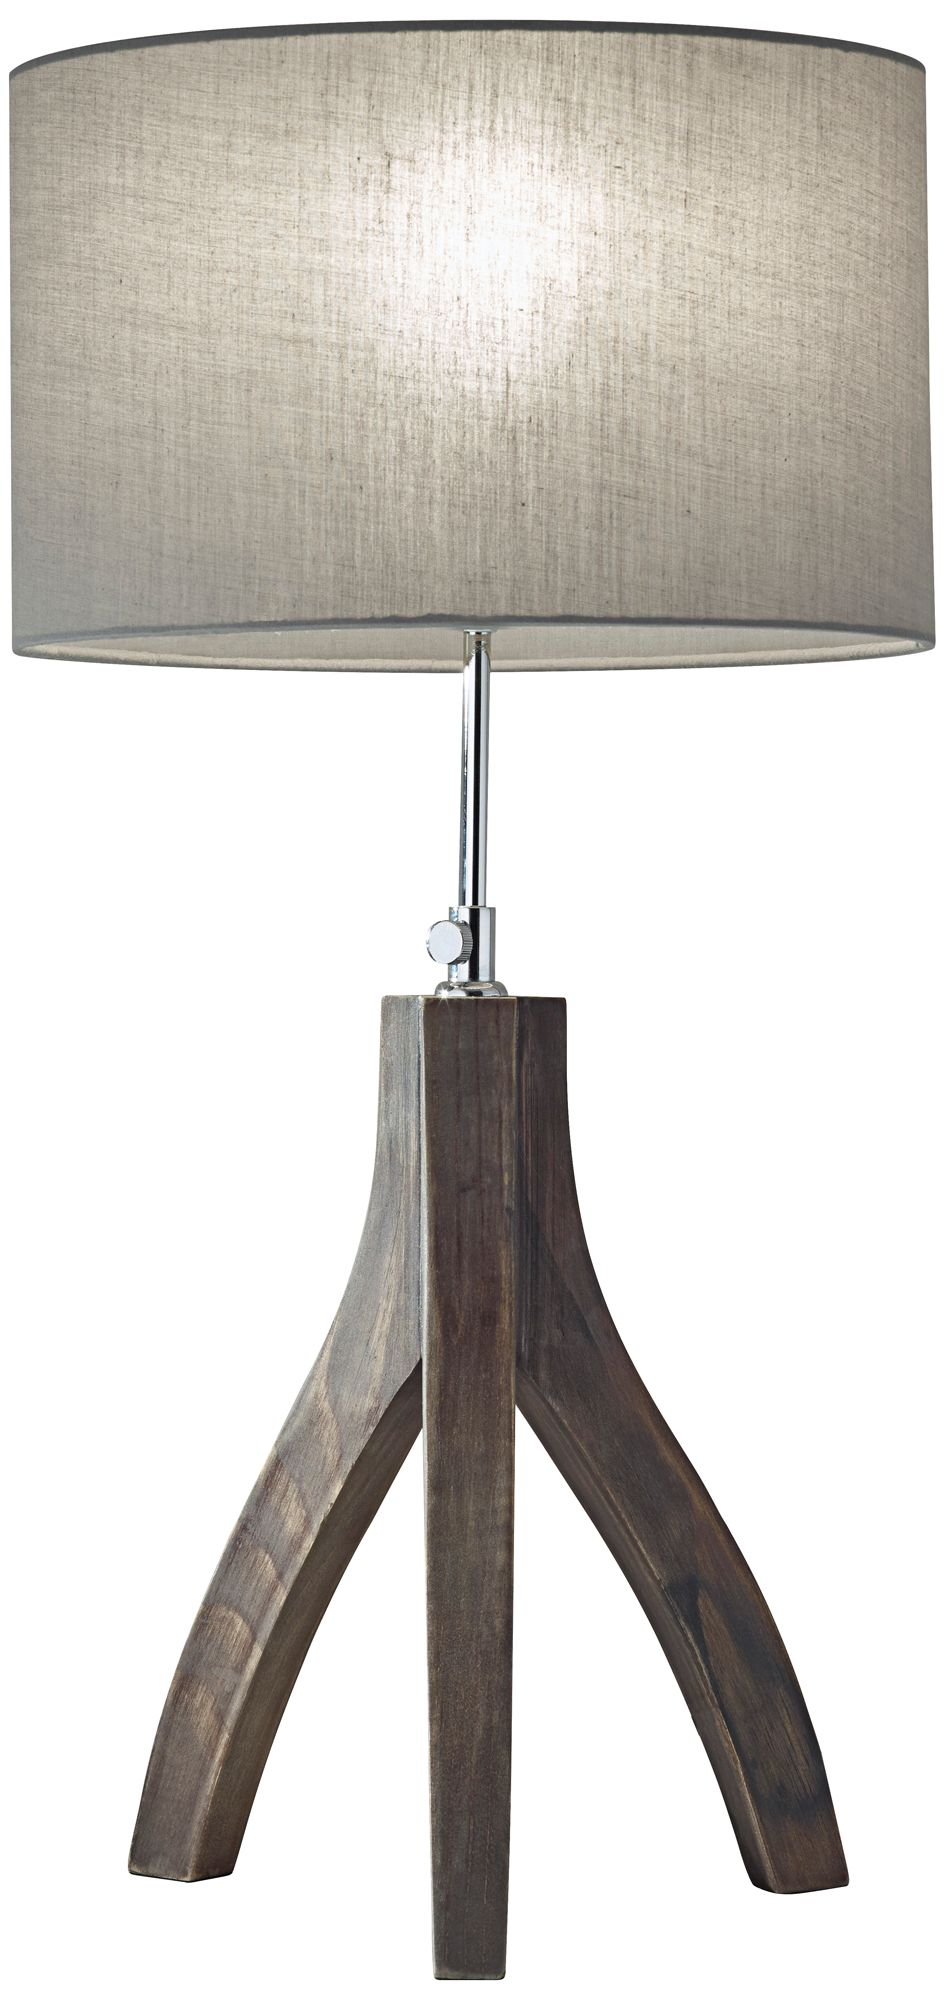 Sherwood Pine Wood Adjustable Tripod Table Lamp